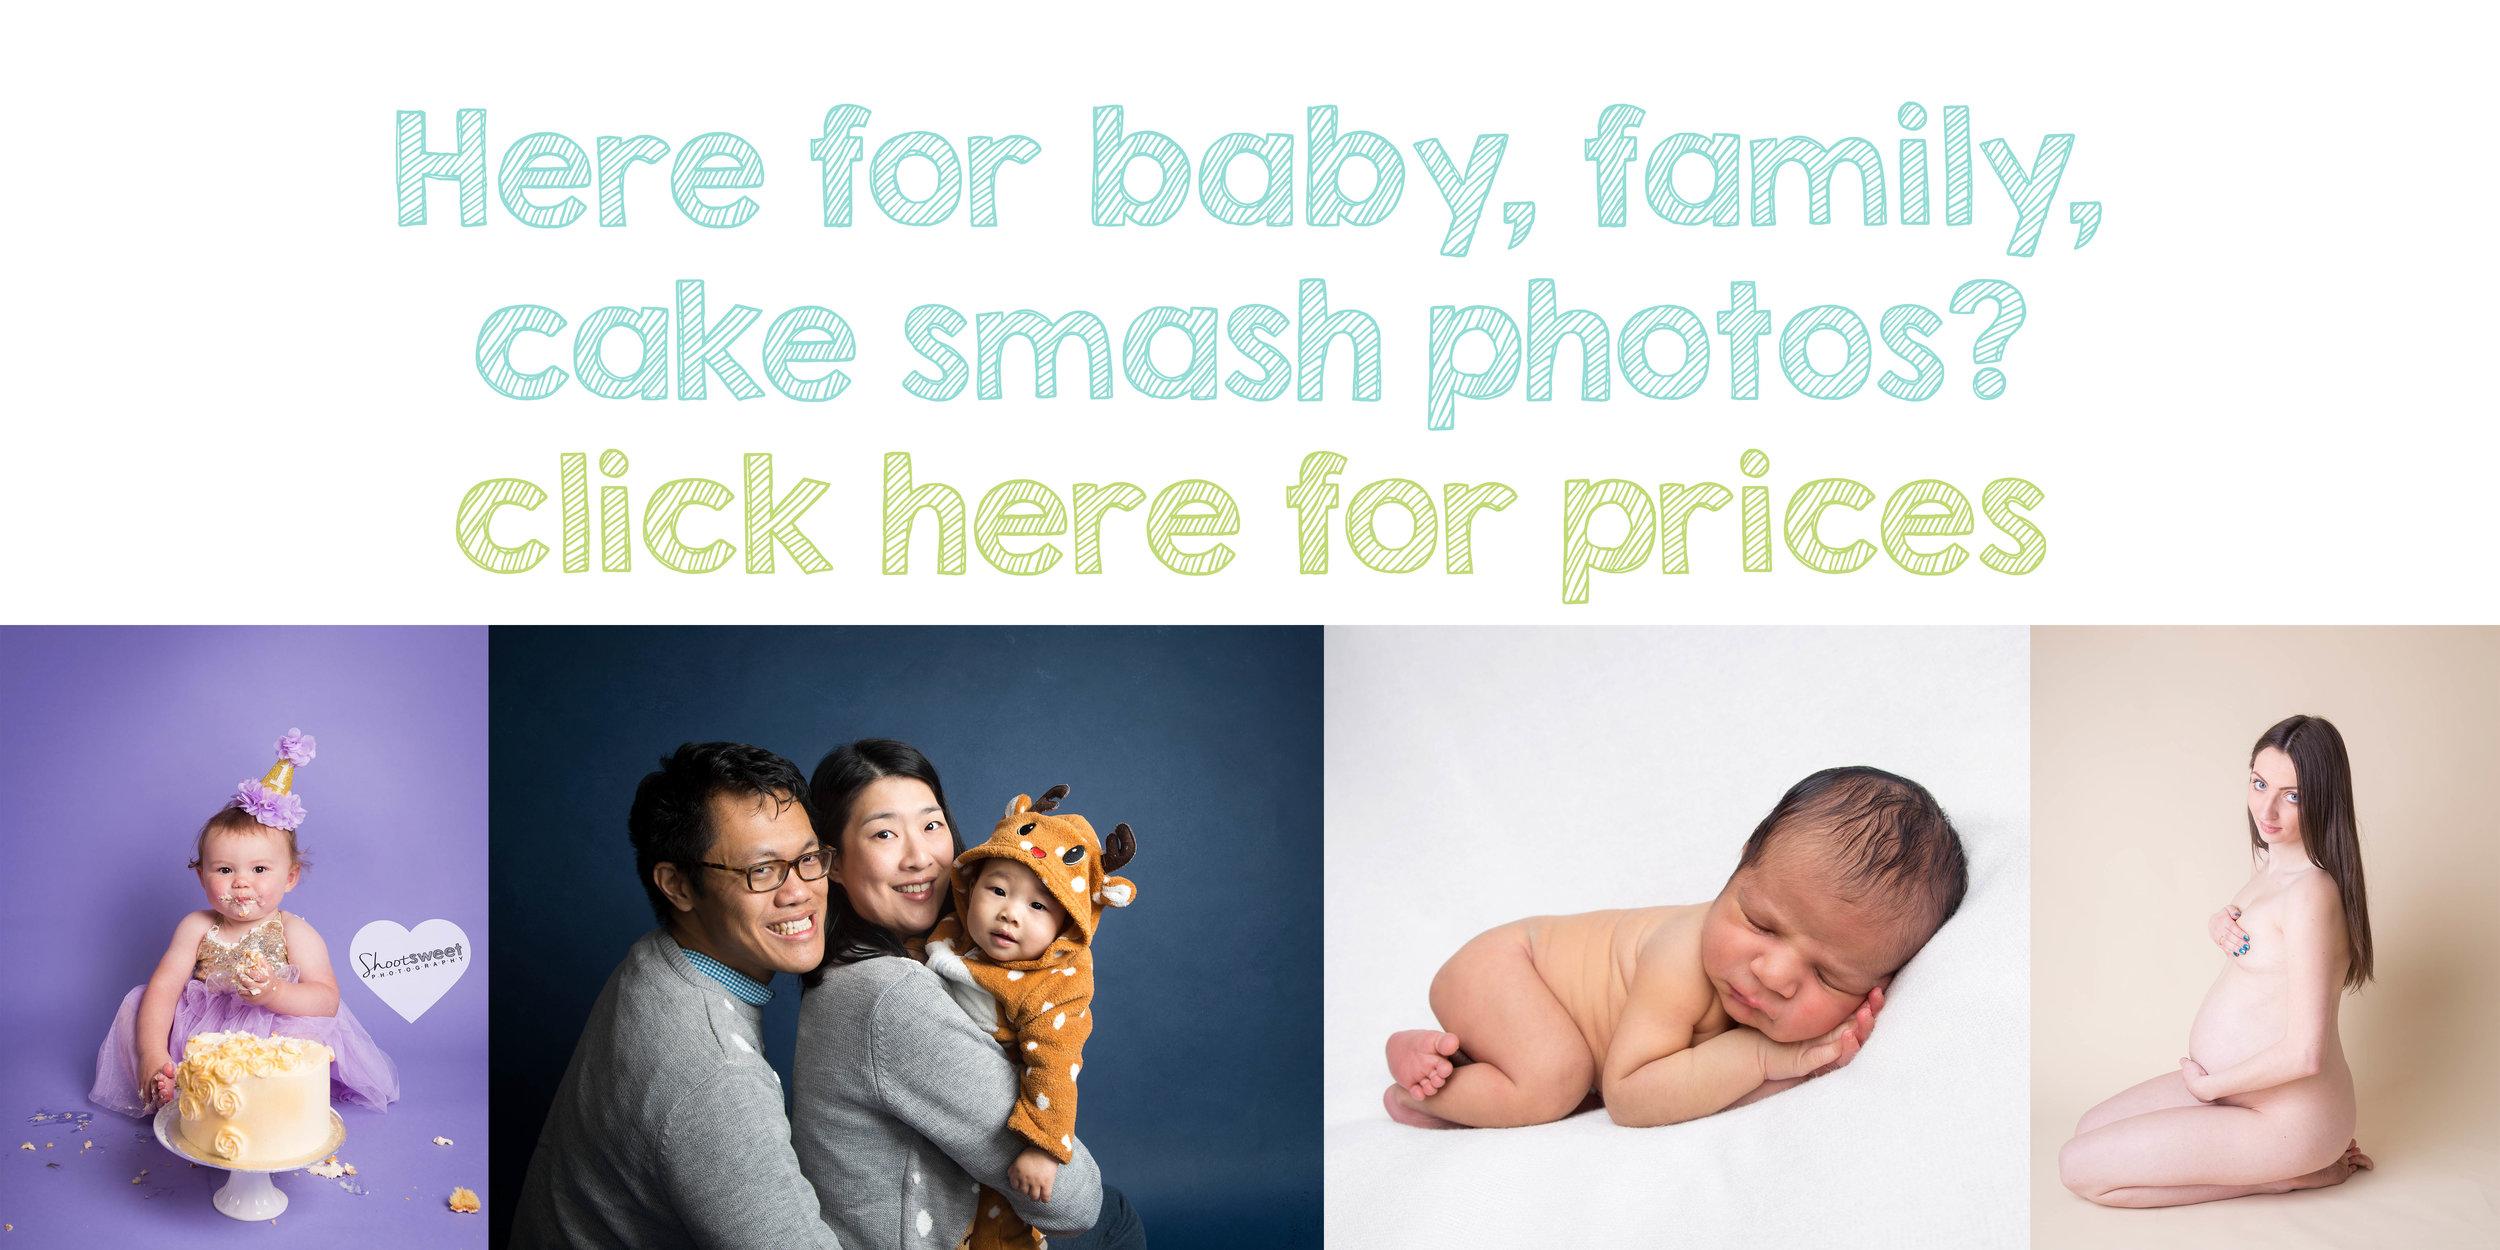 pricelink.jpg